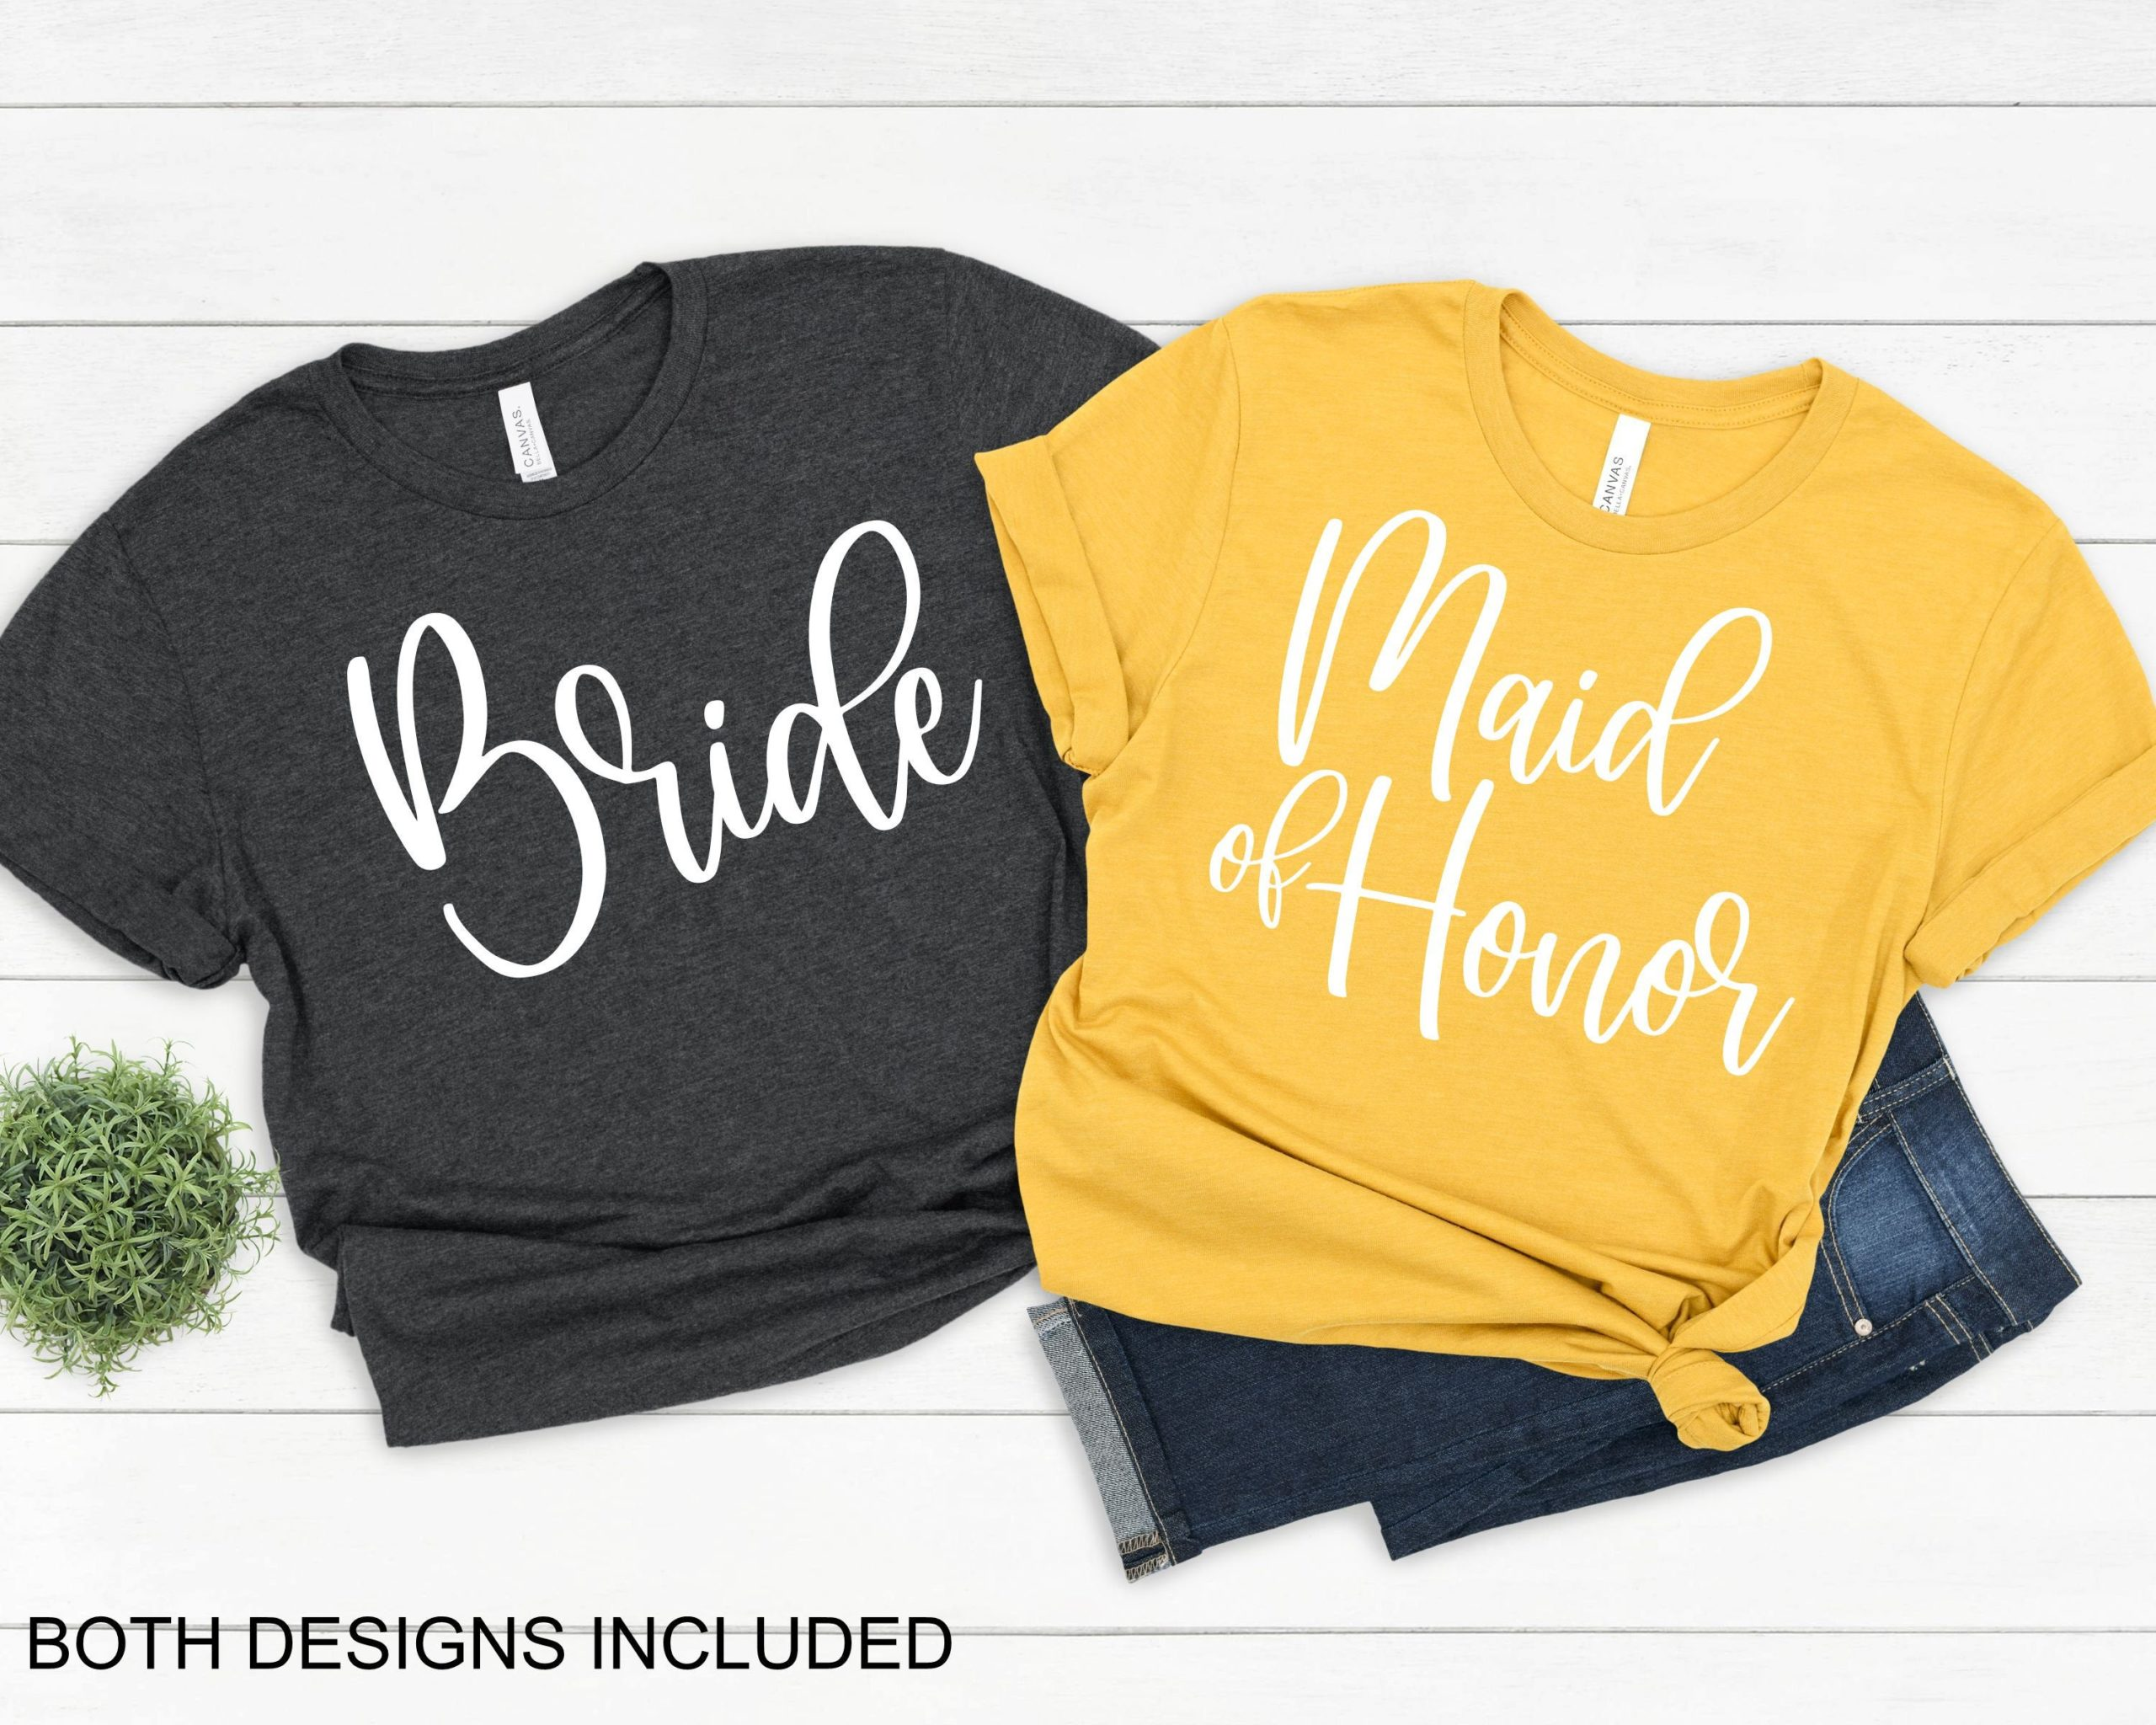 Bride-and-maid-of-honor-svg-maid-of-honor-svg-bridal-party-svg-wedding-svg-design-bachelorette-svg-design-bridesmaid-cricut-svg-600a15cf